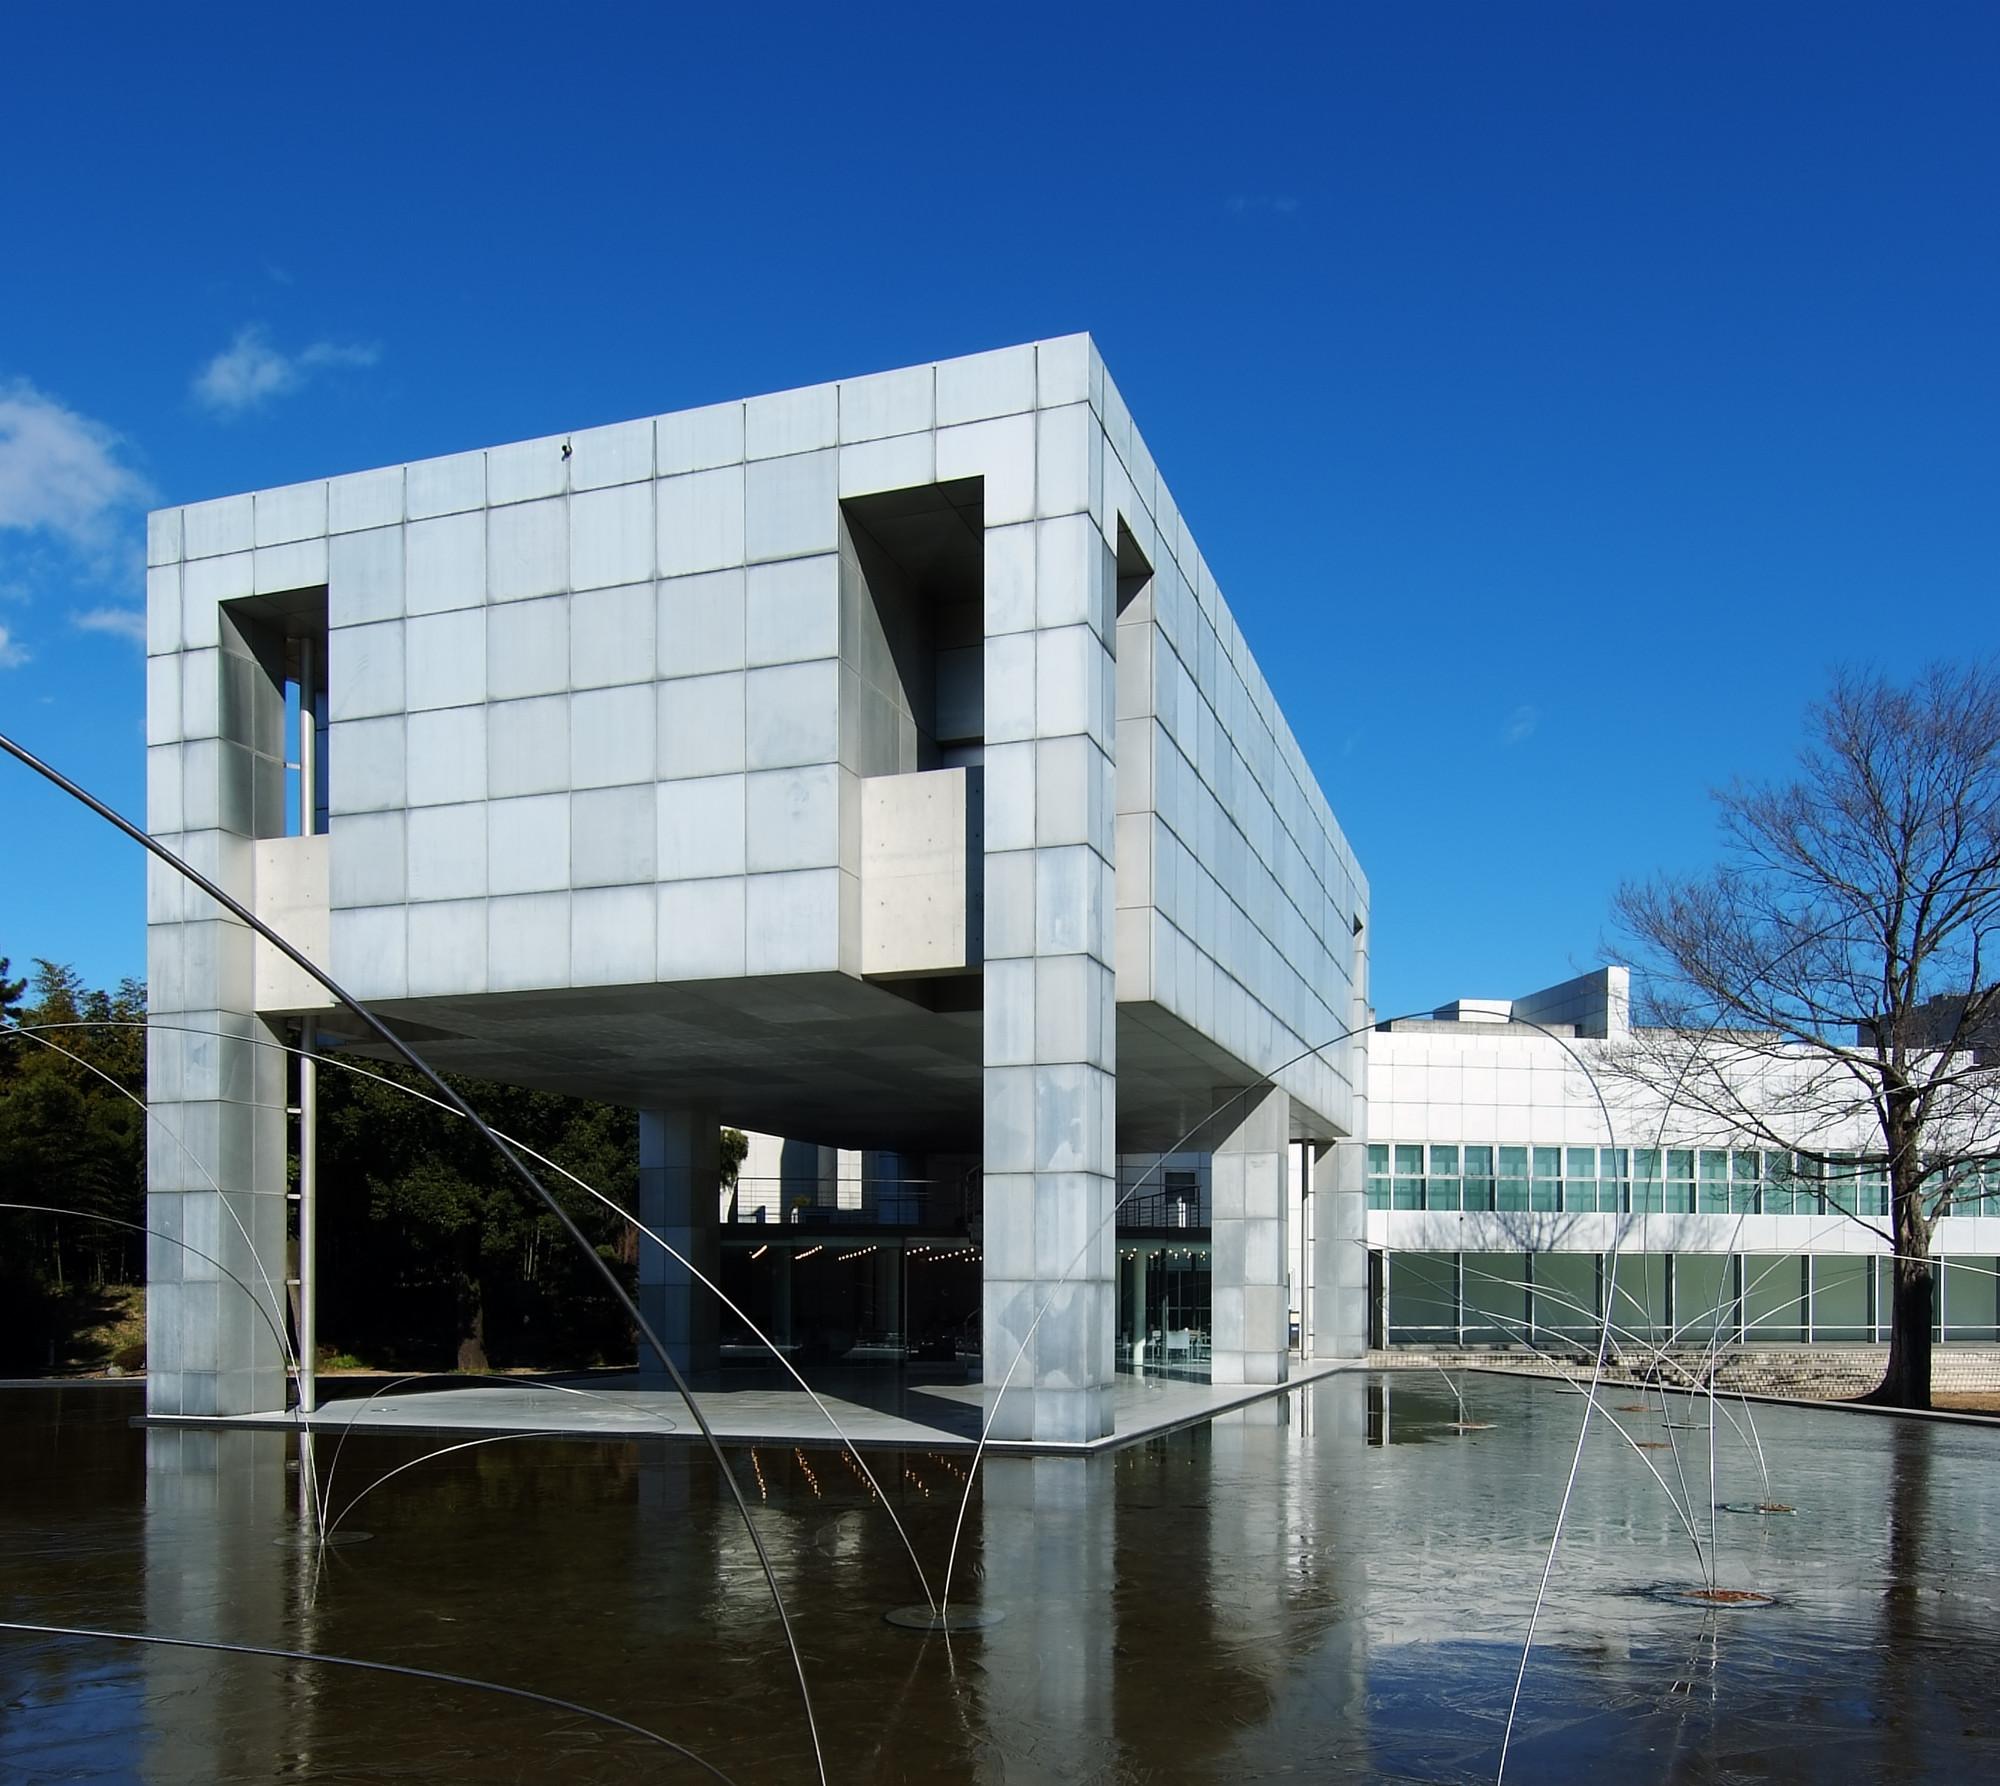 AD Classics: Museum of Modern Art, Gunma / Arata Isozaki, © Wiiii / Wikimedia Commons